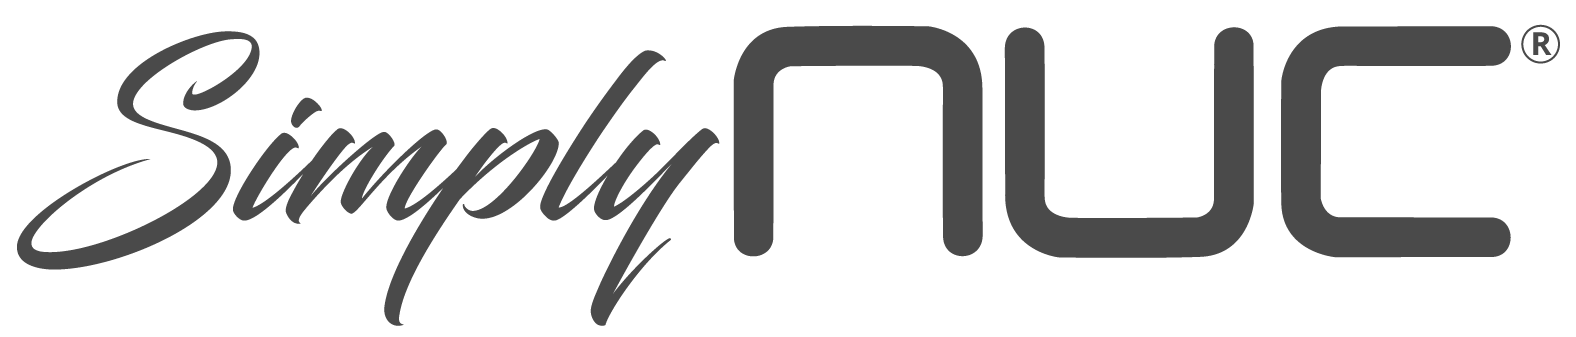 Simply NUC grey logo